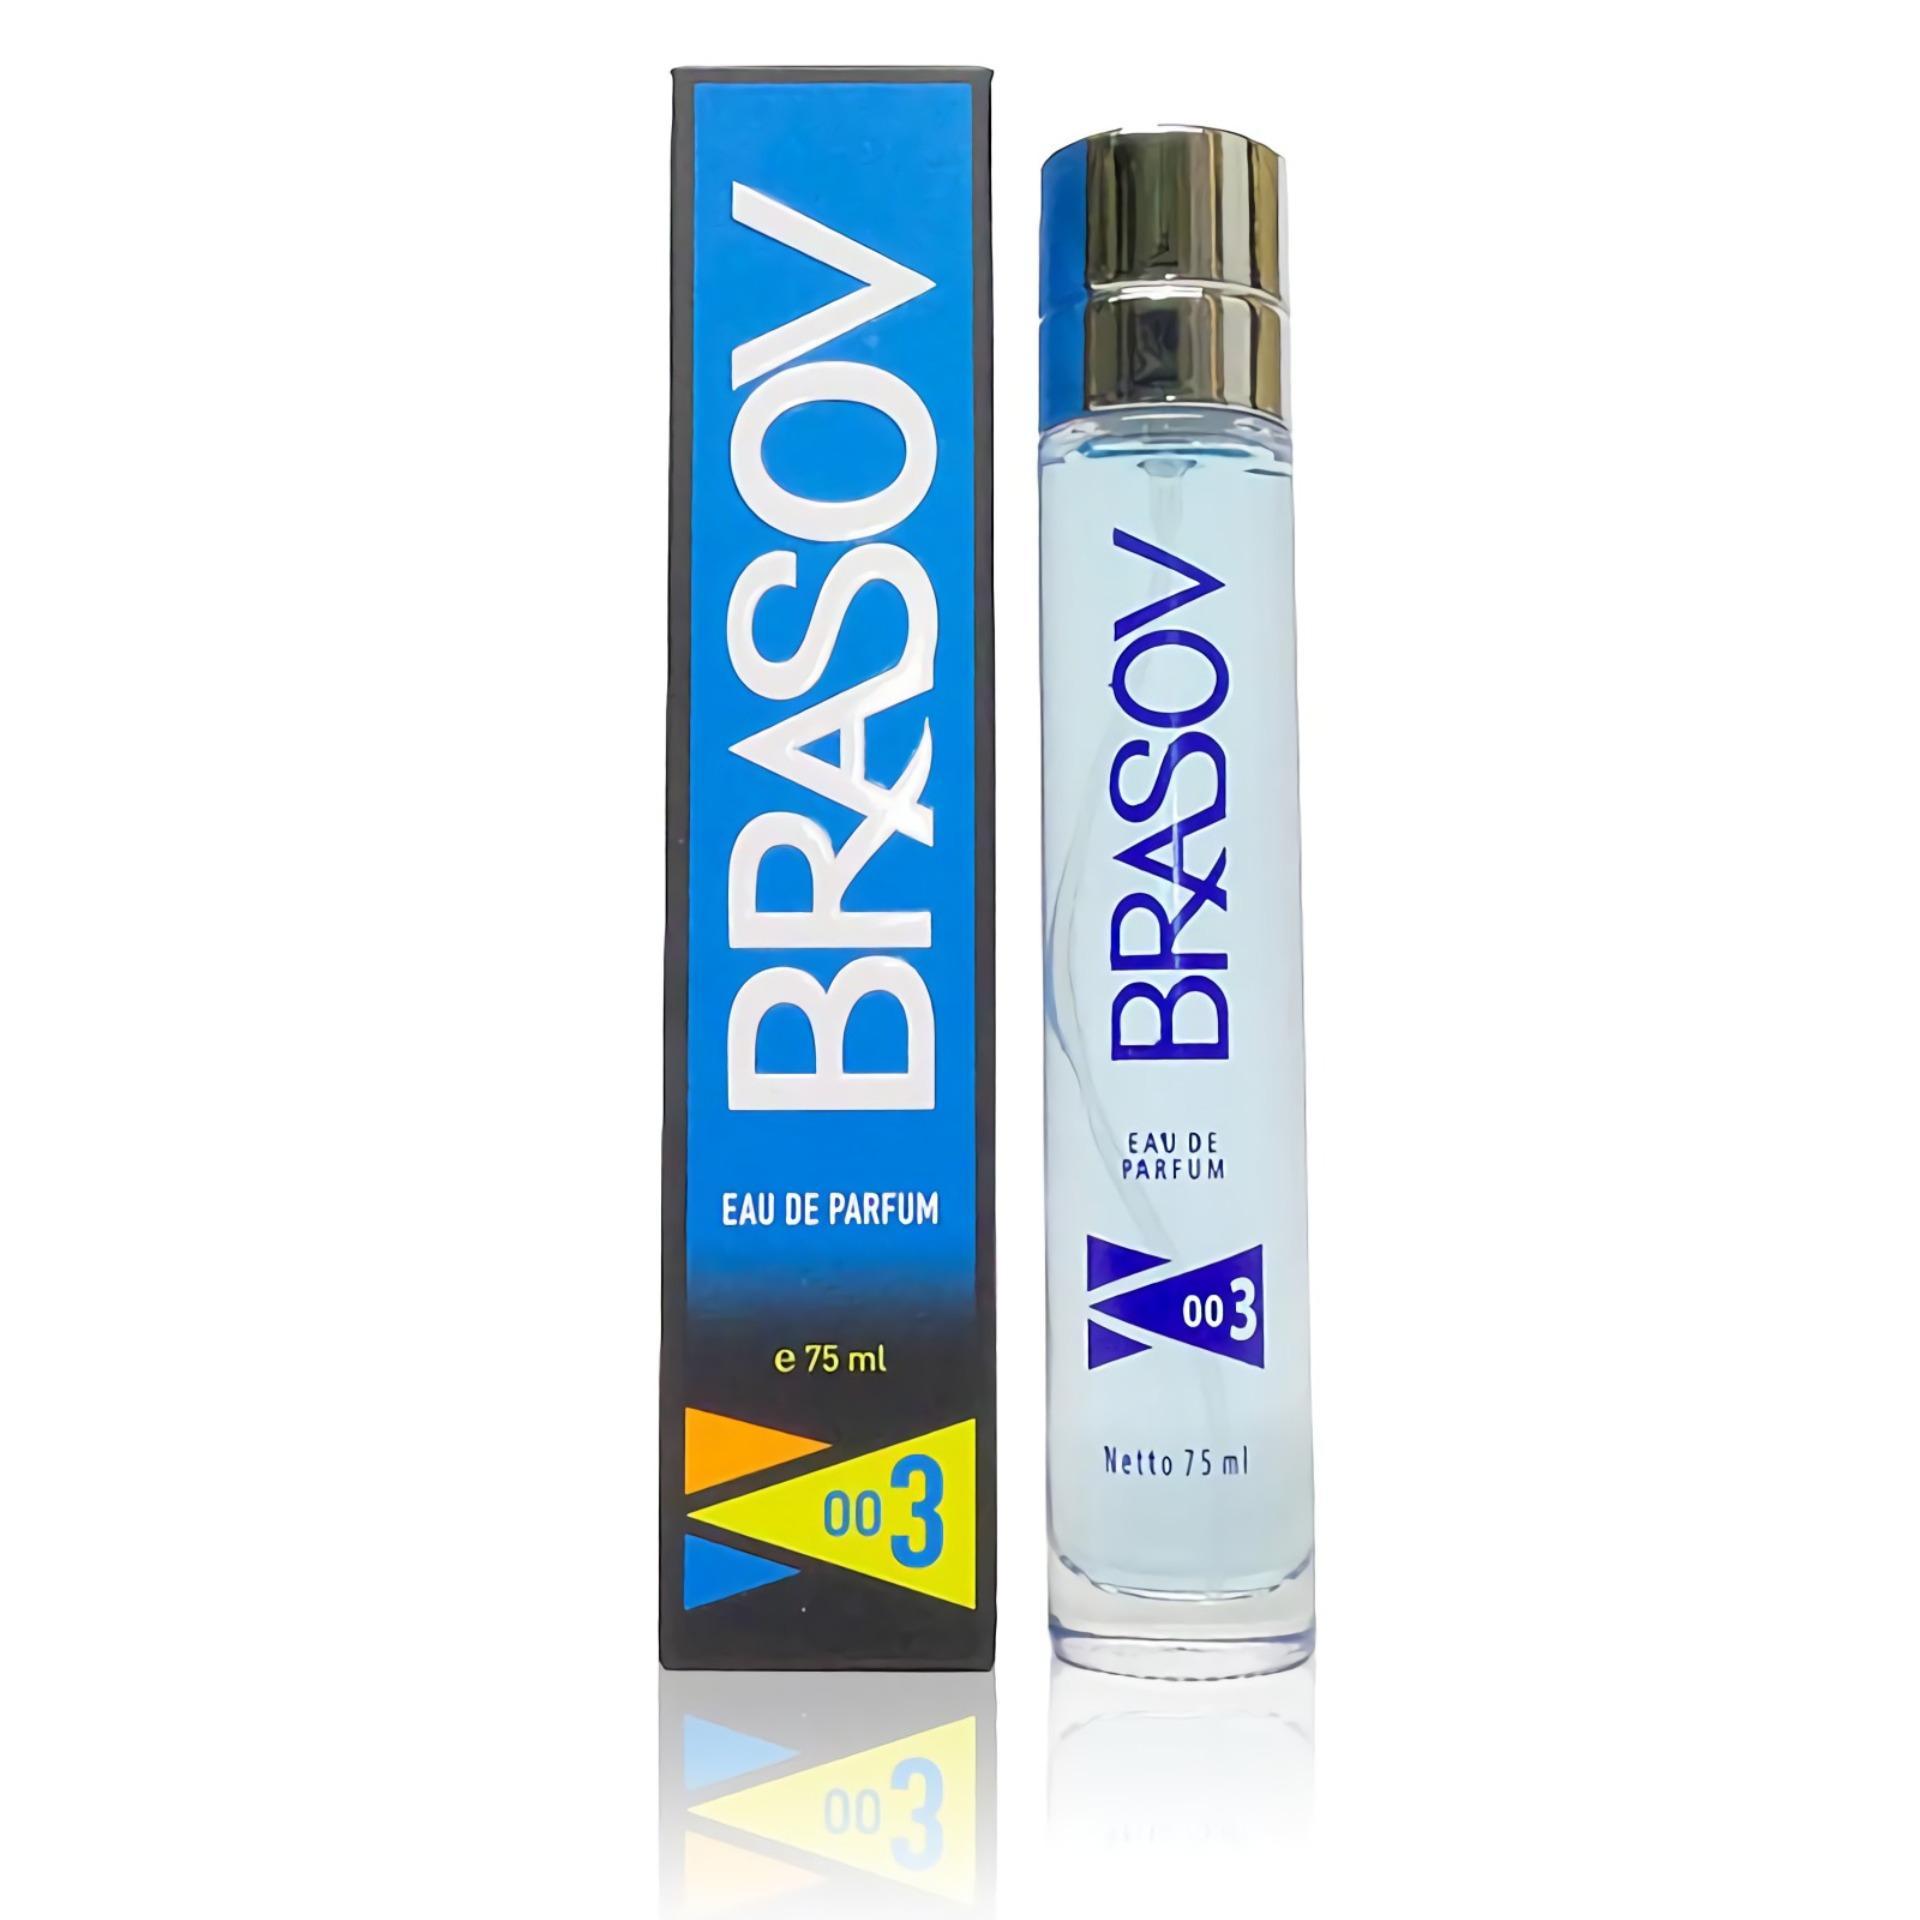 BRASOV Eau De Parfum XX-CT-671566 003 75 ml Perfume Cologne - Biru